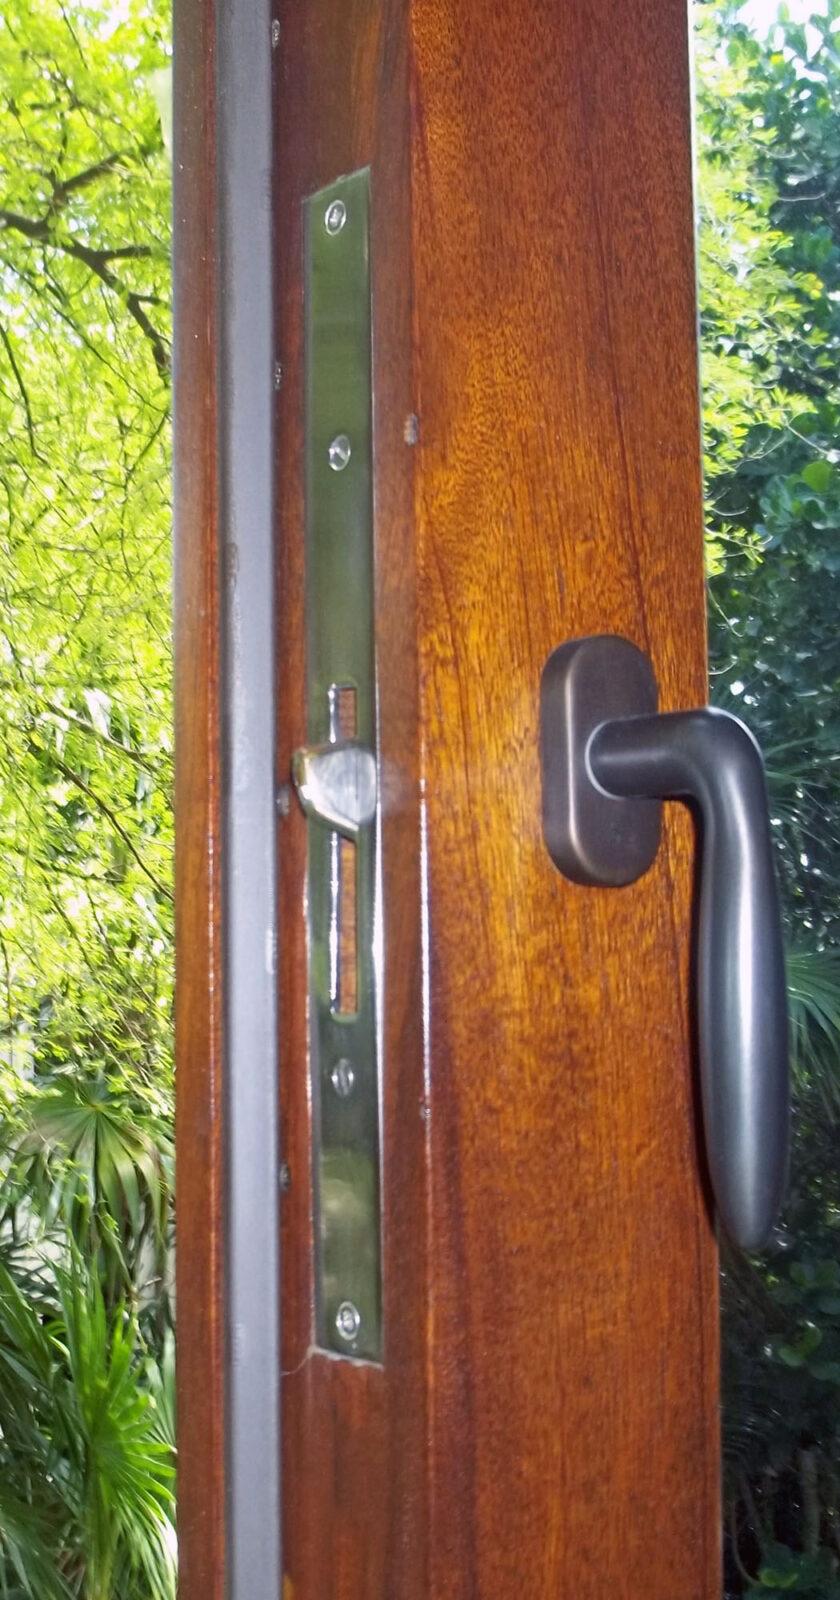 TAHITI BEACH CASEMENT WINDOWS